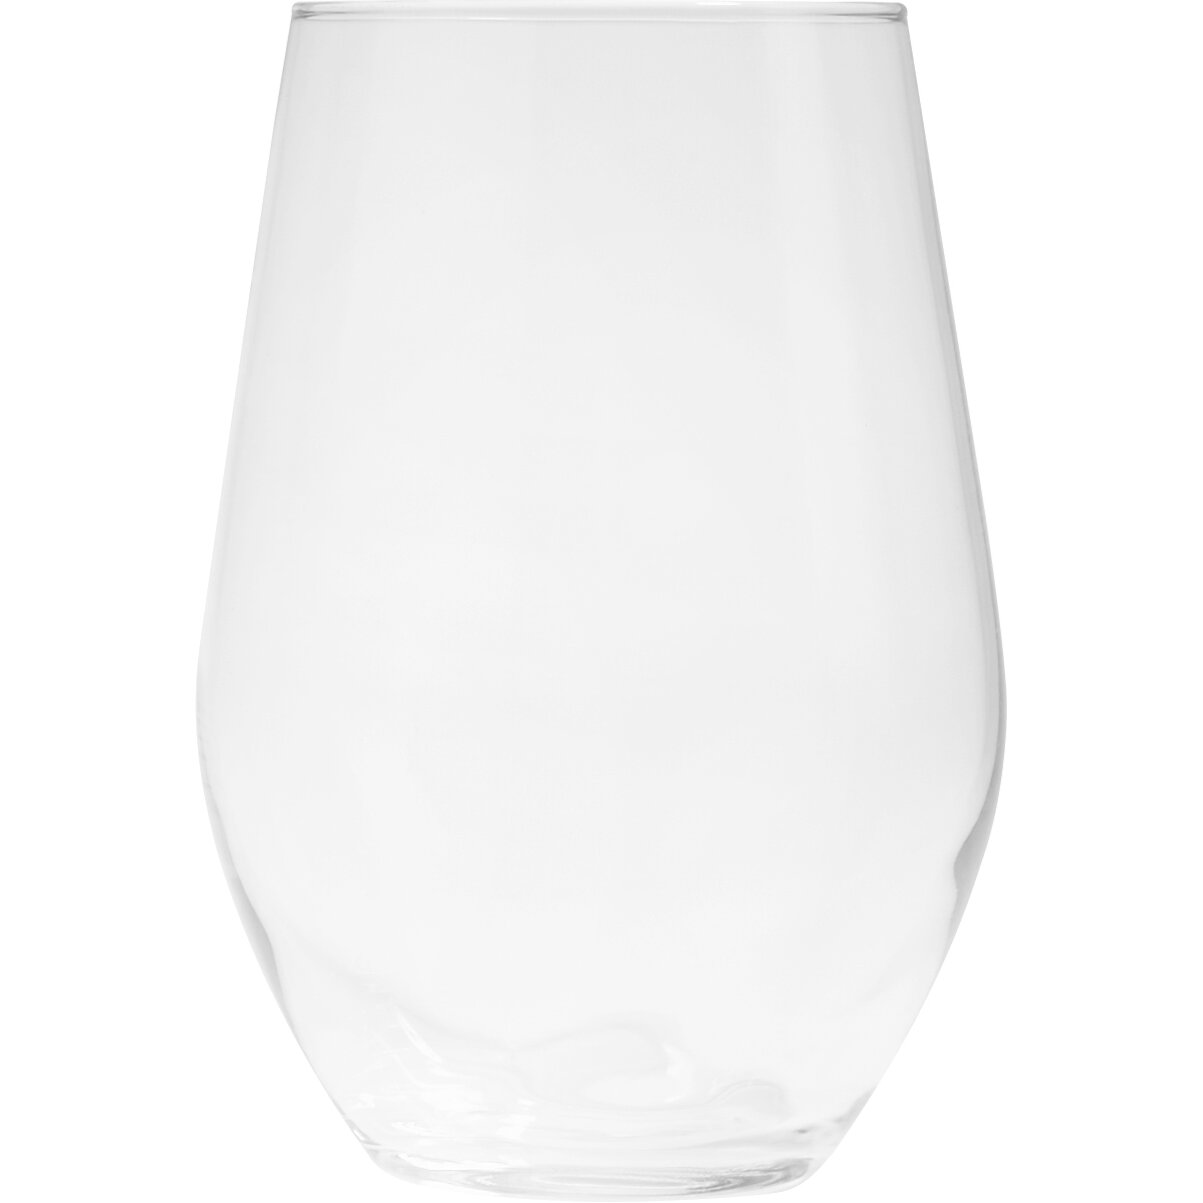 luminarc concerto btd 19 oz stemless wine glass reviews. Black Bedroom Furniture Sets. Home Design Ideas